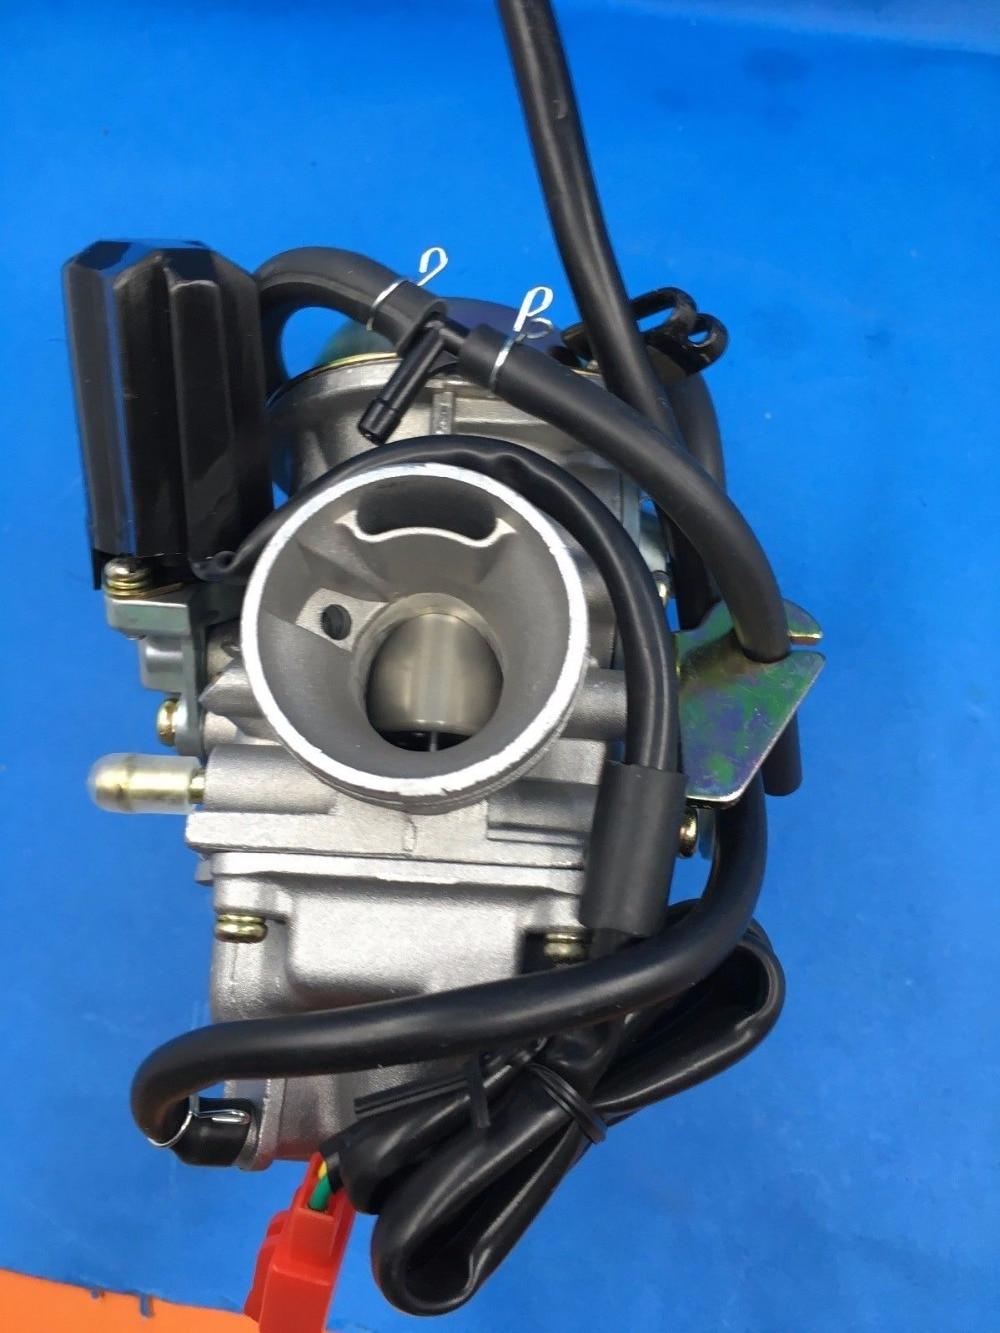 hight resolution of oem pd24j carburetor carb electric choke 125cc 150cc scooter atv gy6 4 stroke qmj152 157